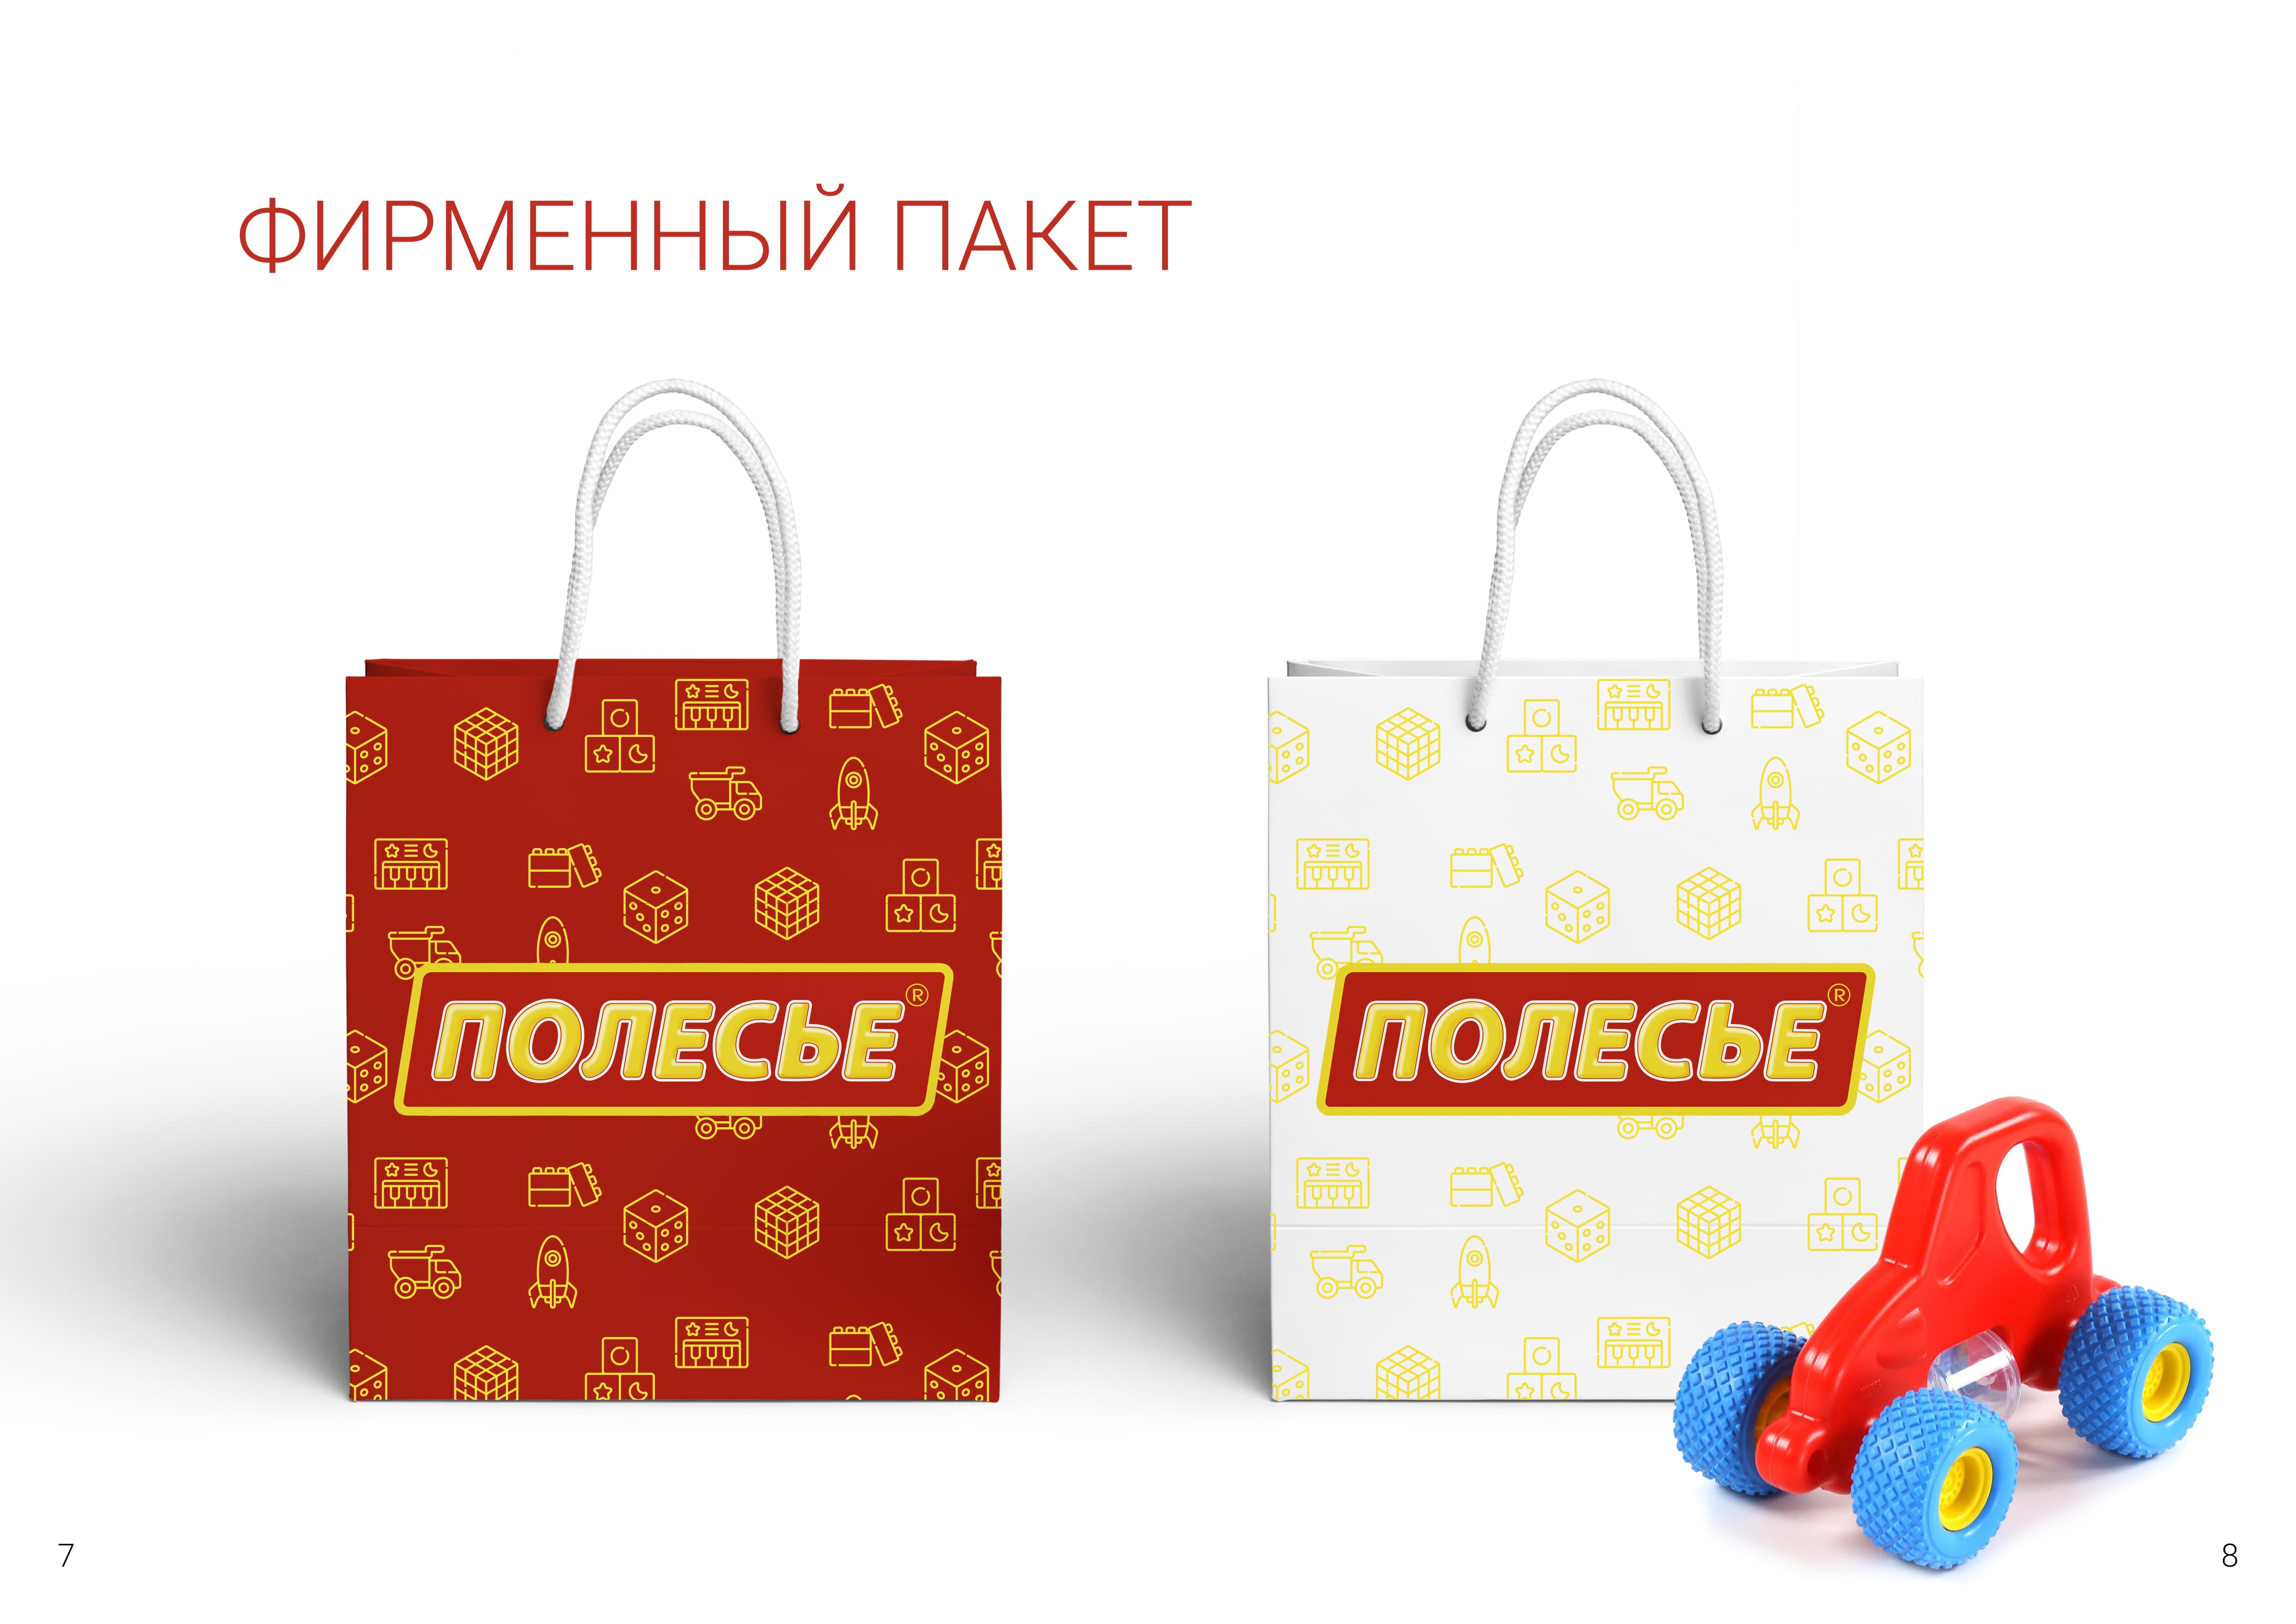 Разработка фирменного стиля на основании готового логотипа фото f_8645aba495a0bd97.jpg